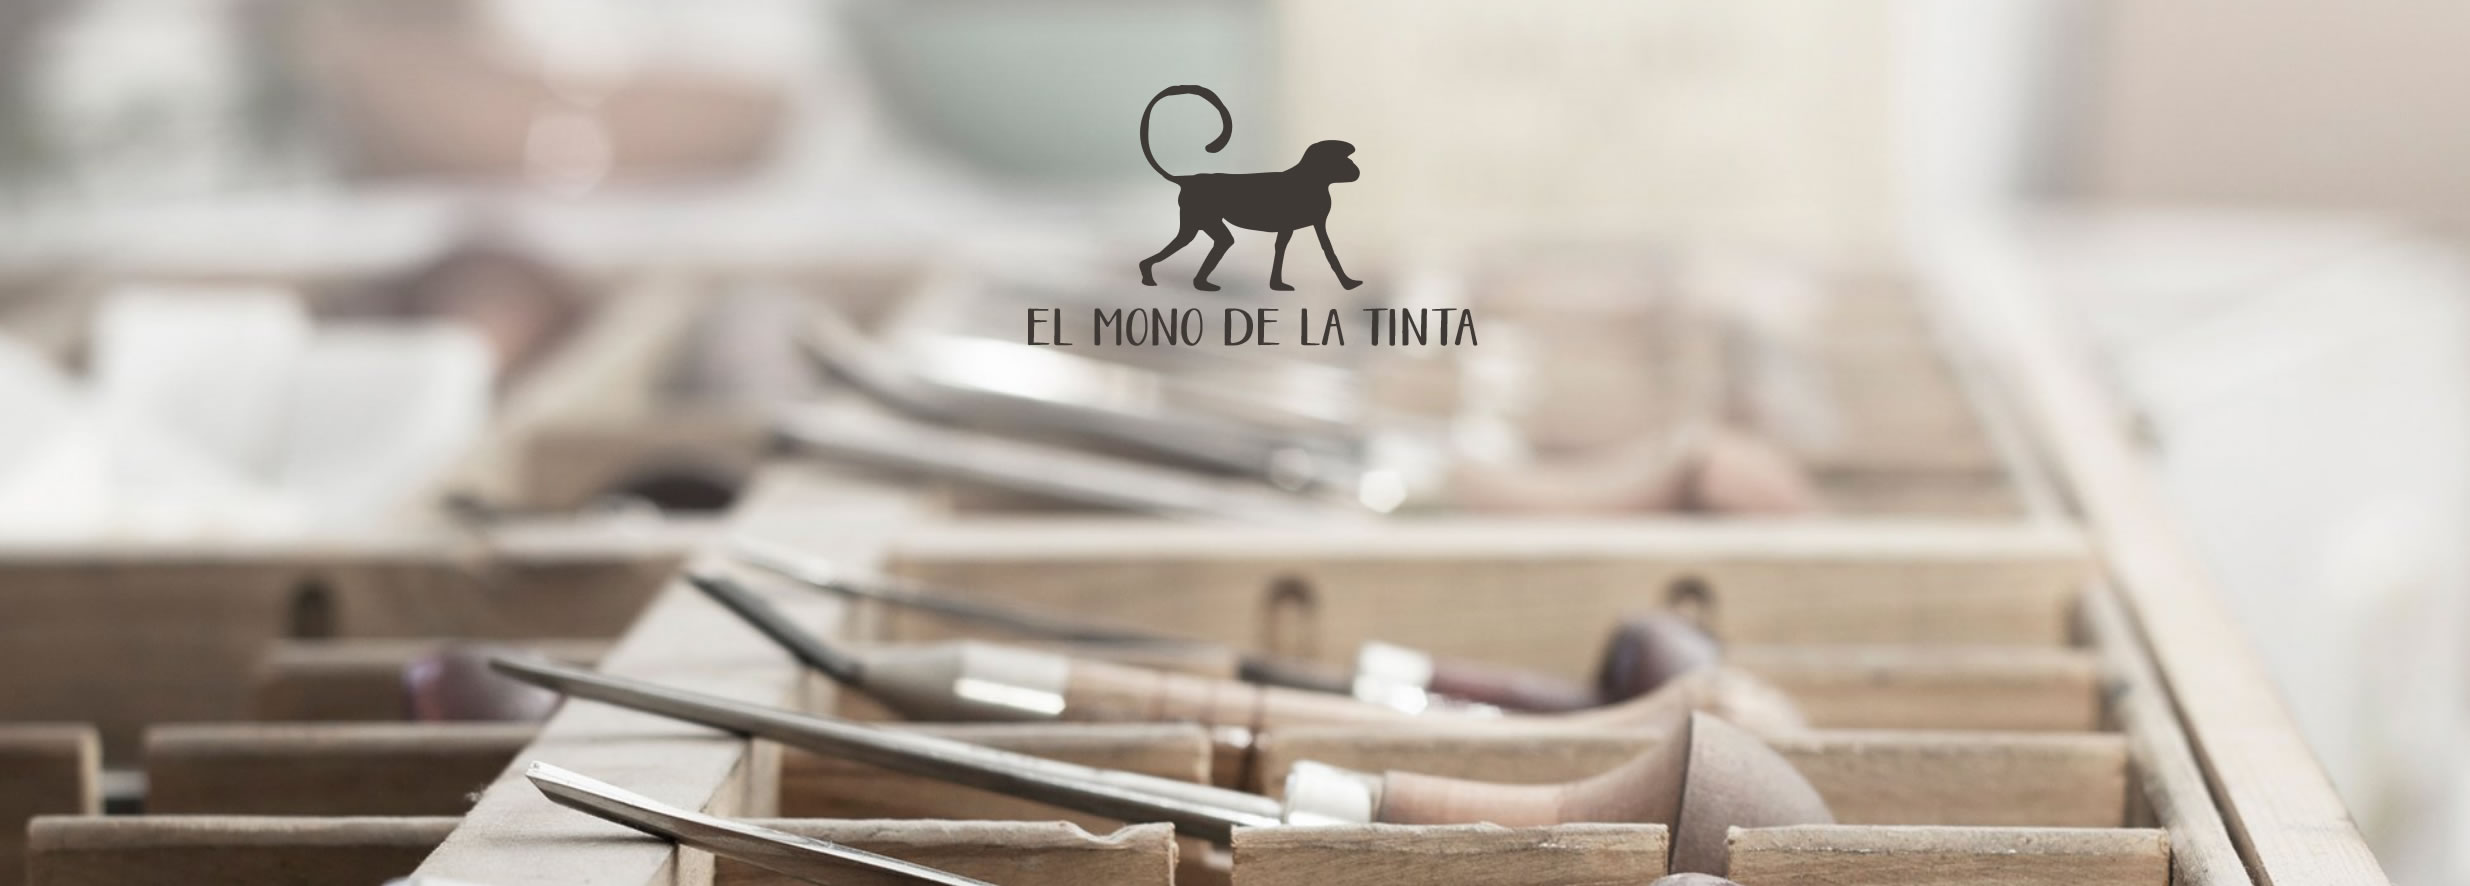 el_mono_de_la_tinta_galeria_de_gravura